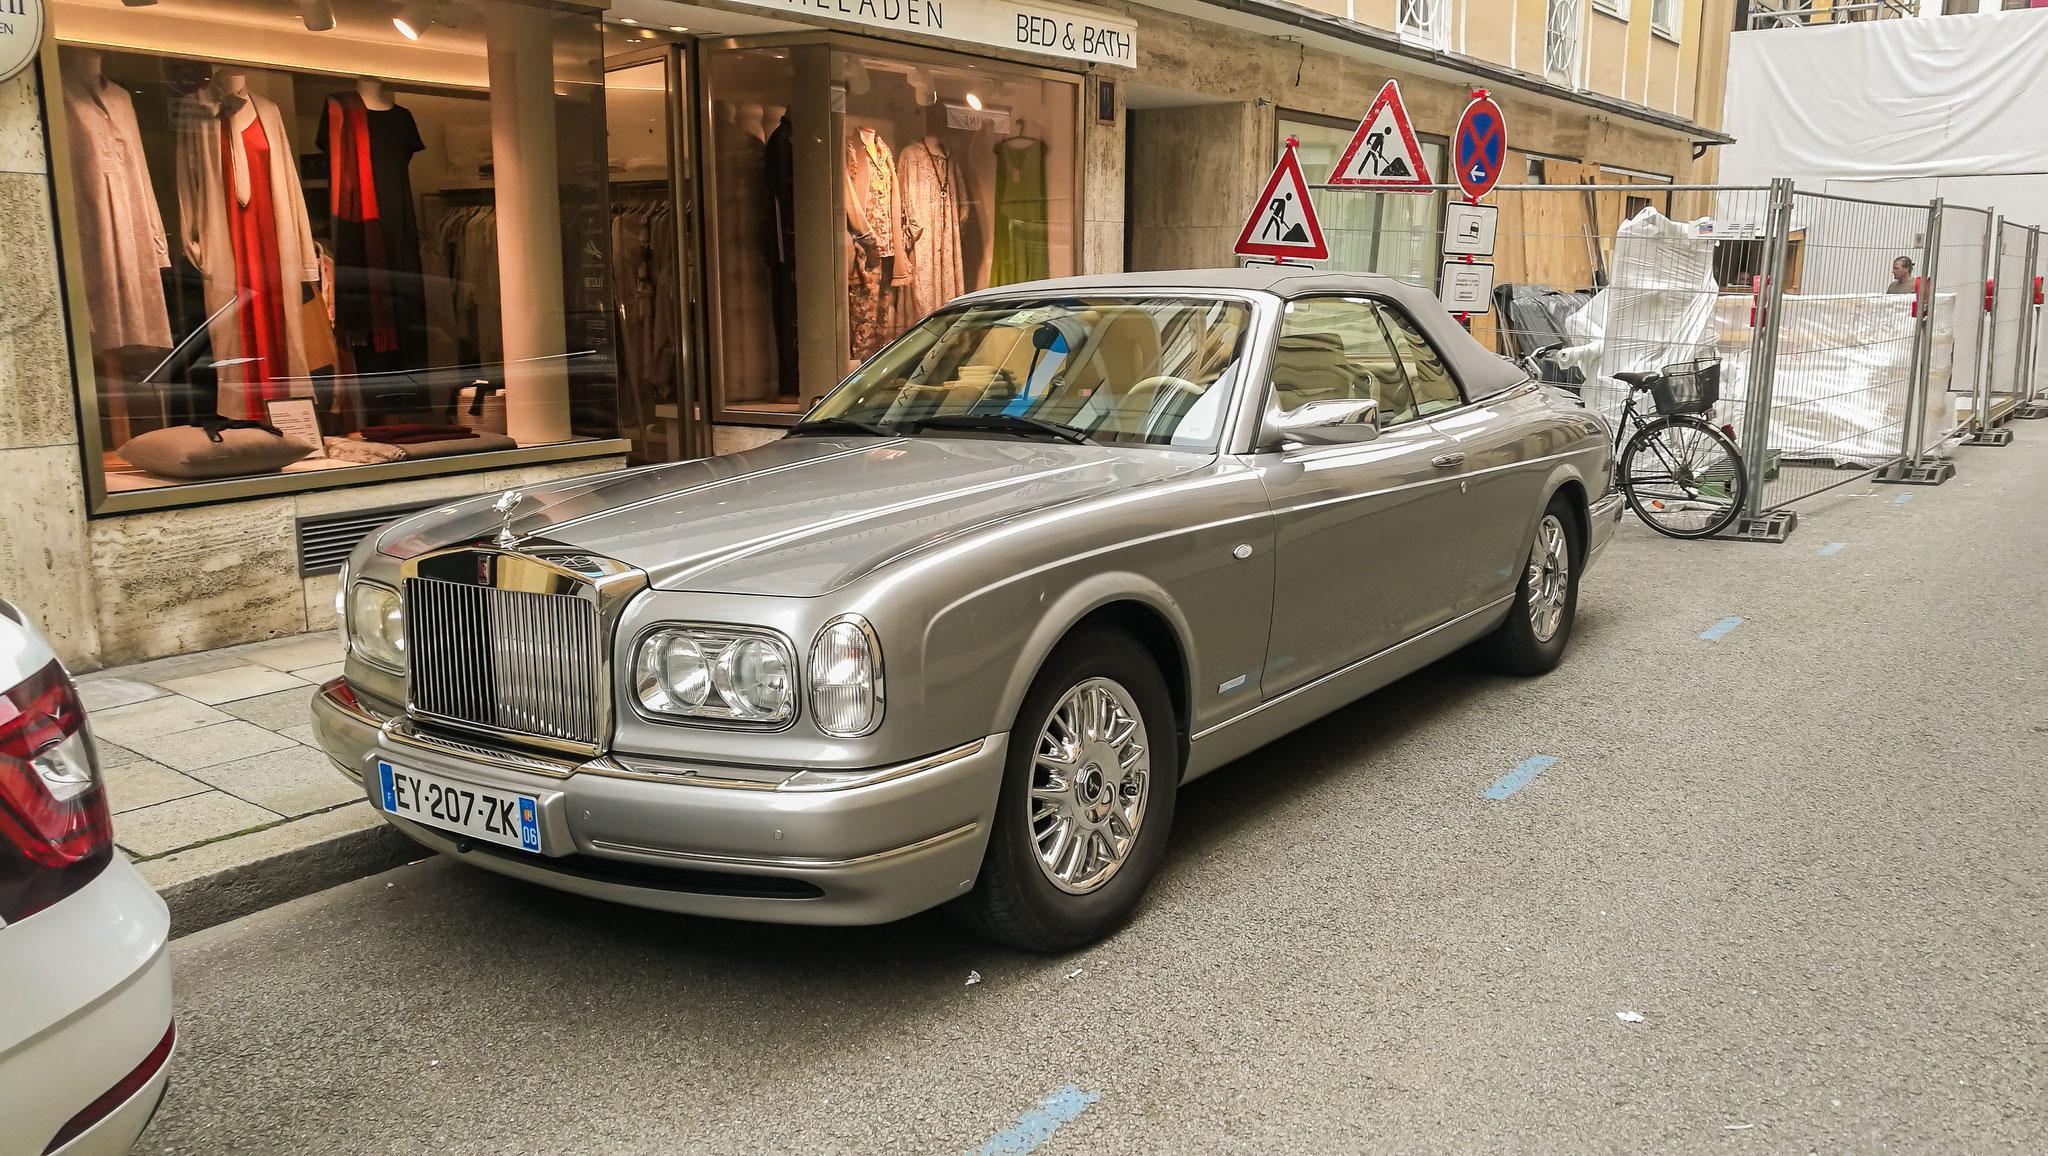 Rolls Royce Corniche V - EY-207-ZK-06 (FRA)